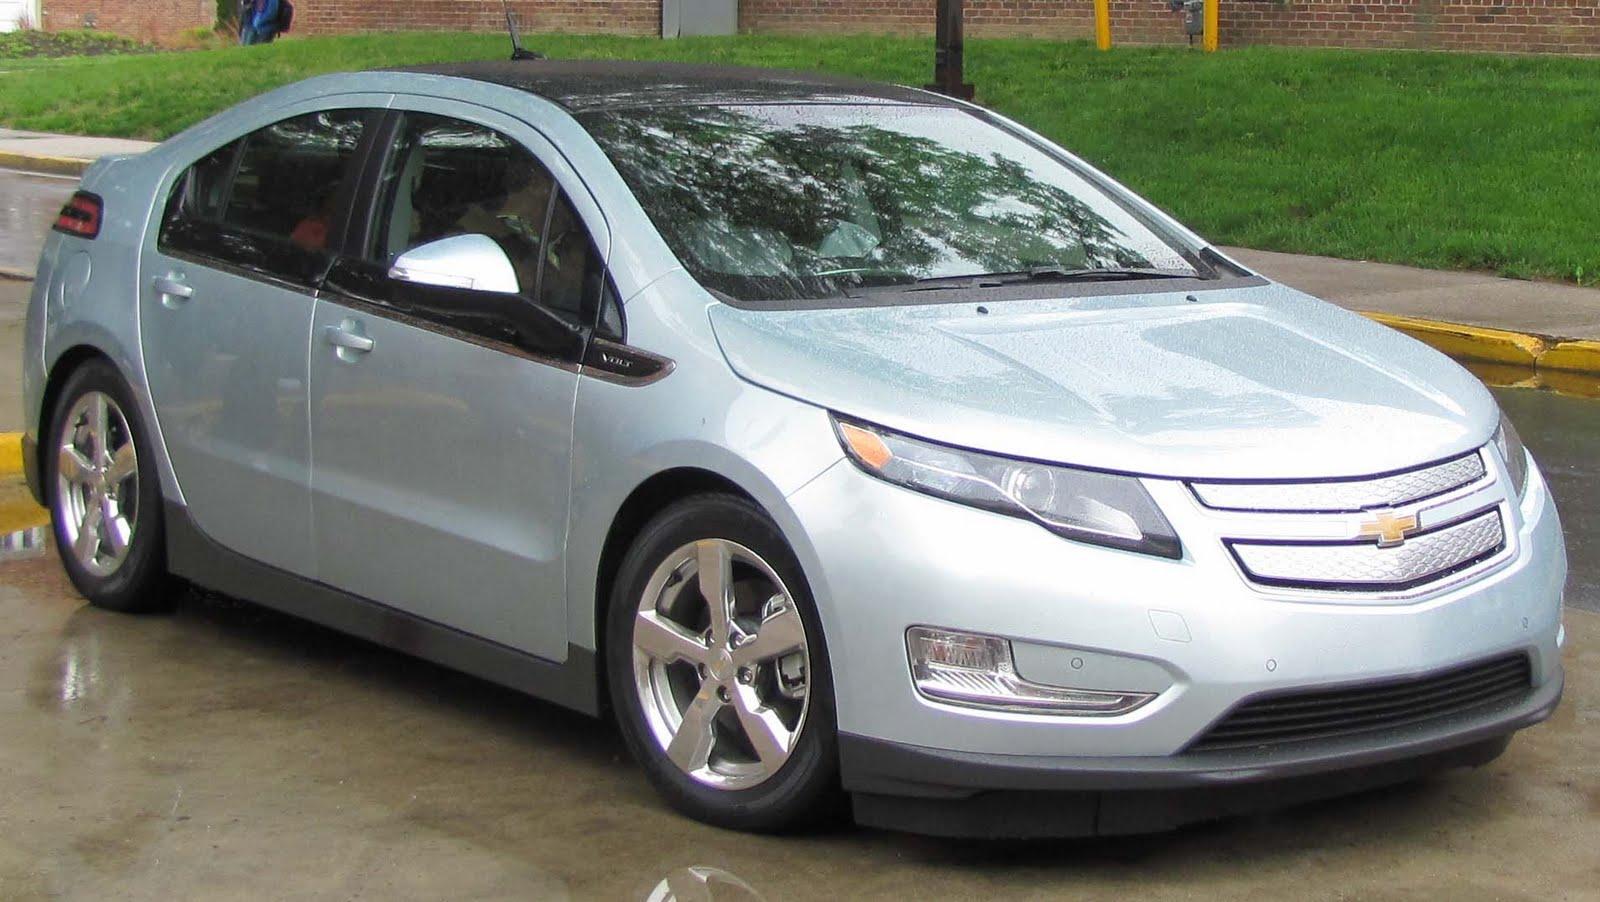 Electric Vehicle News: November 2010